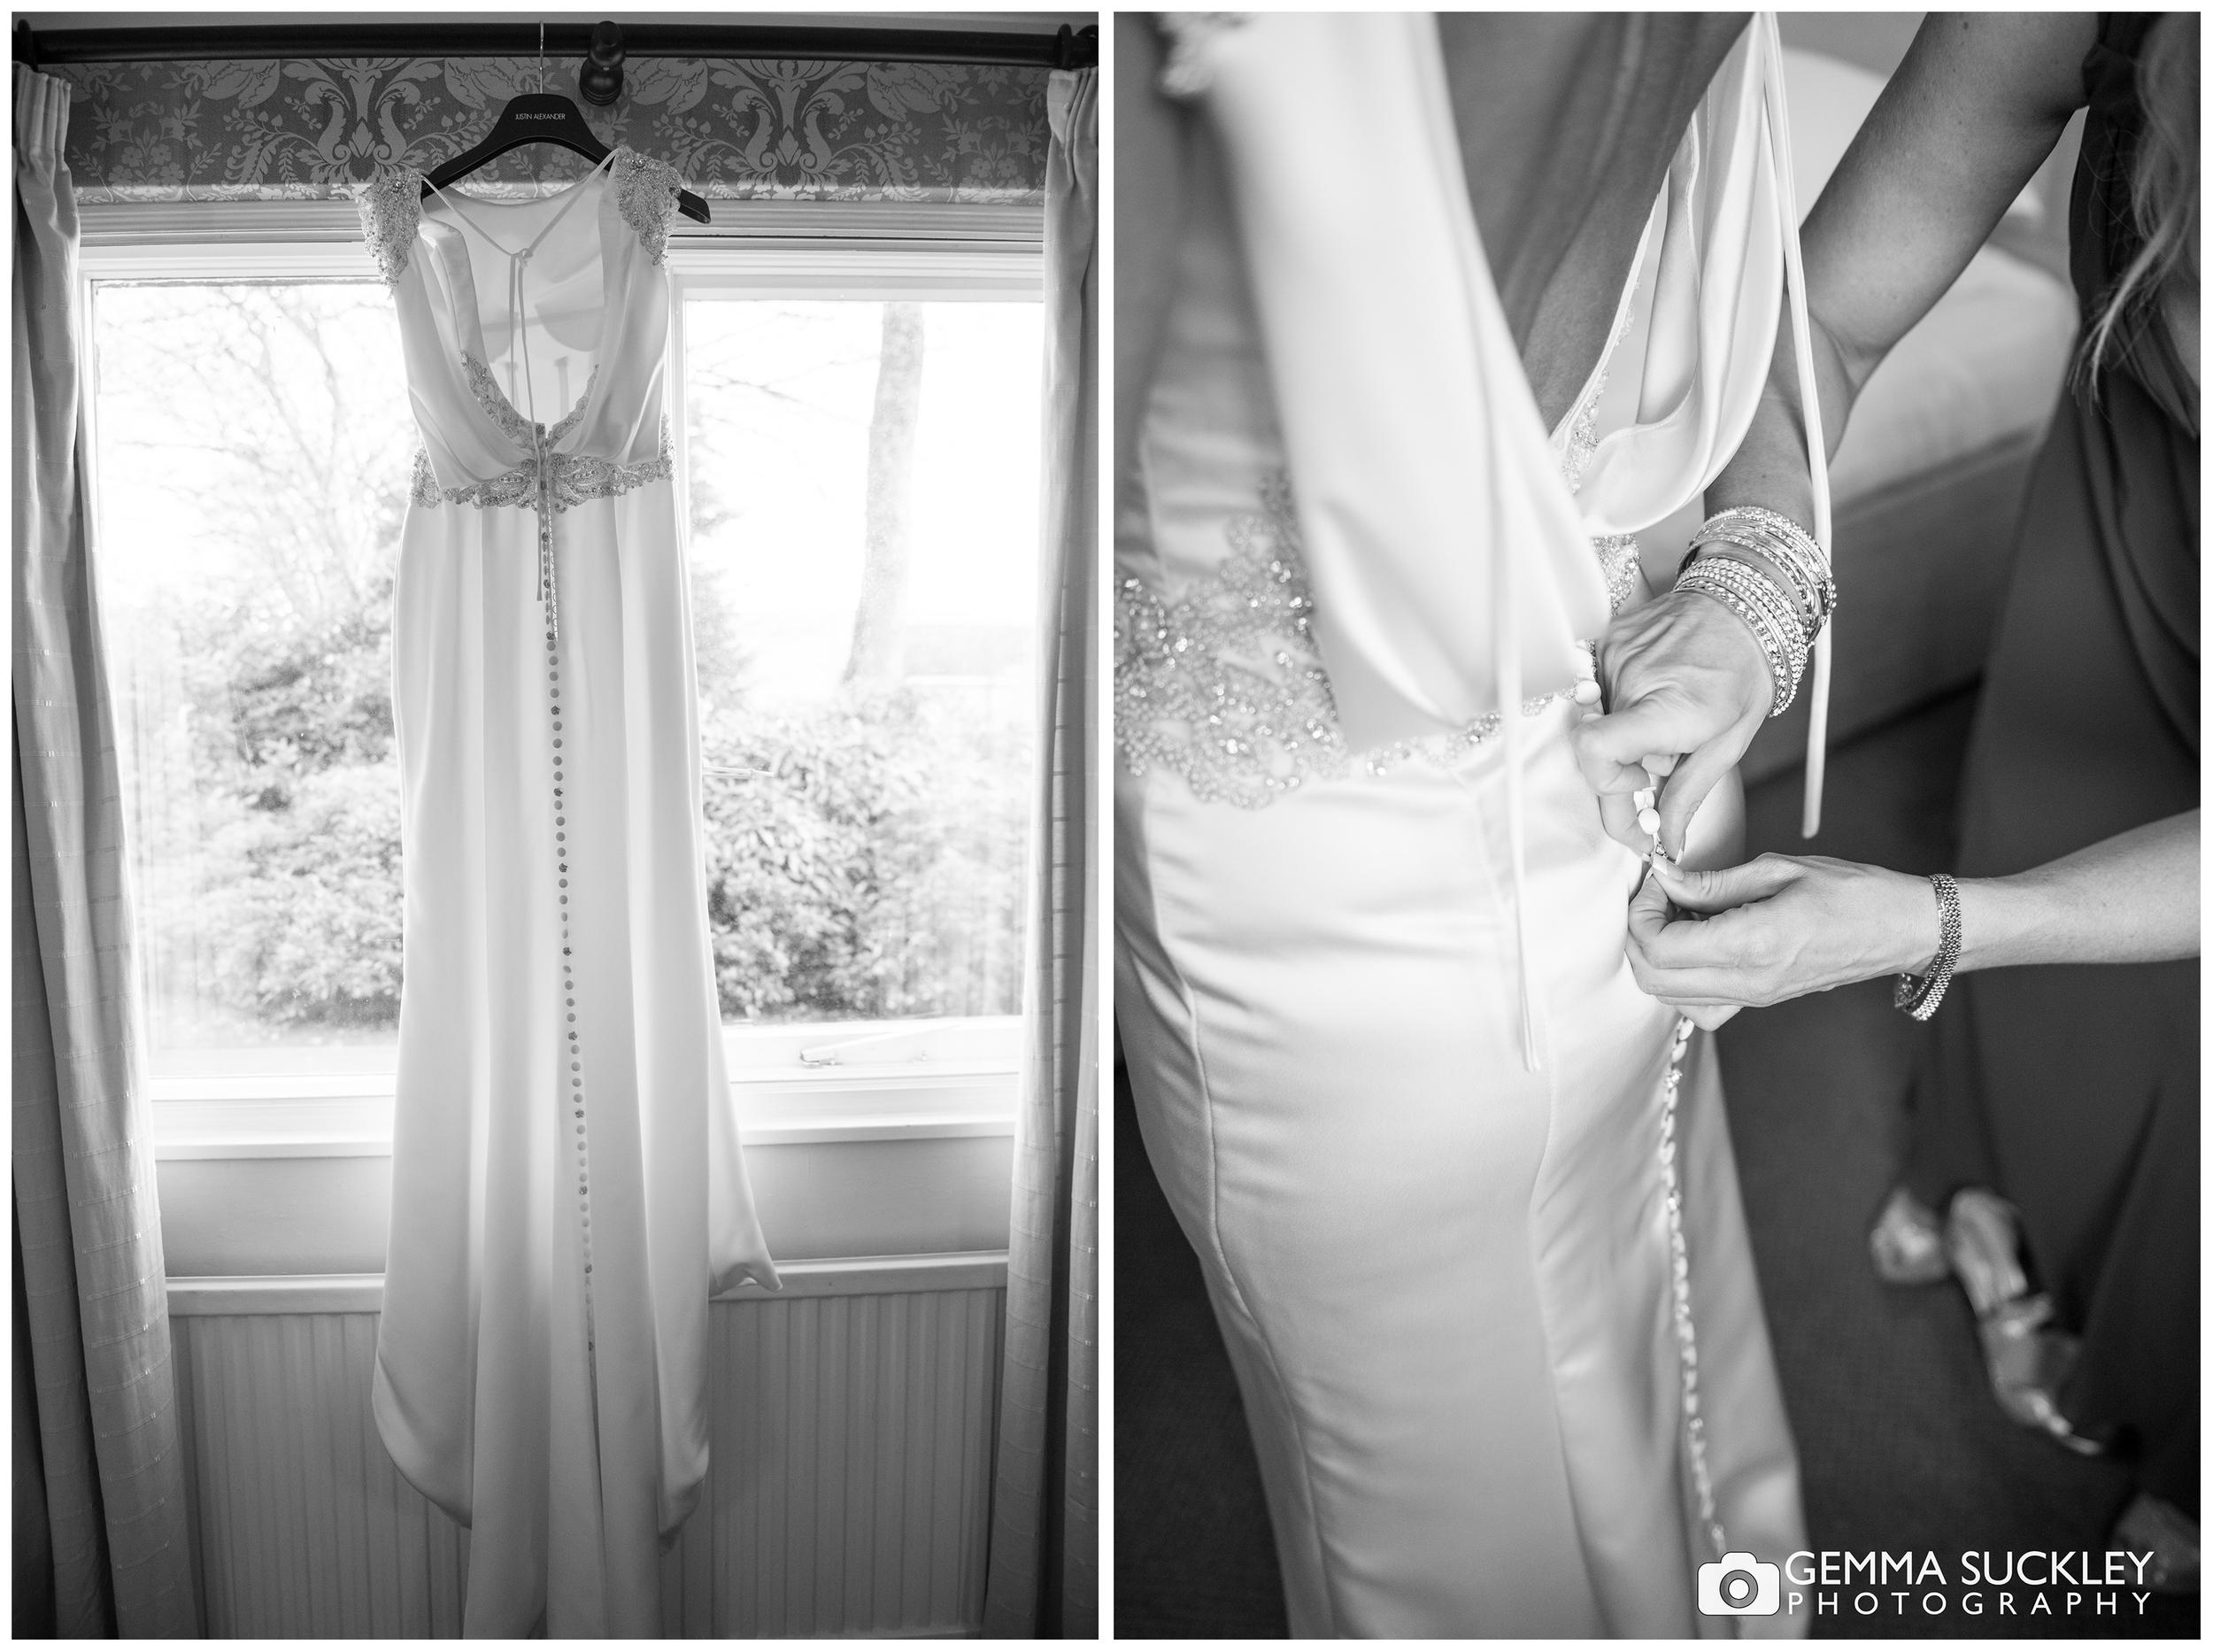 Elegance-of-scholes-wedding-dress.jpg